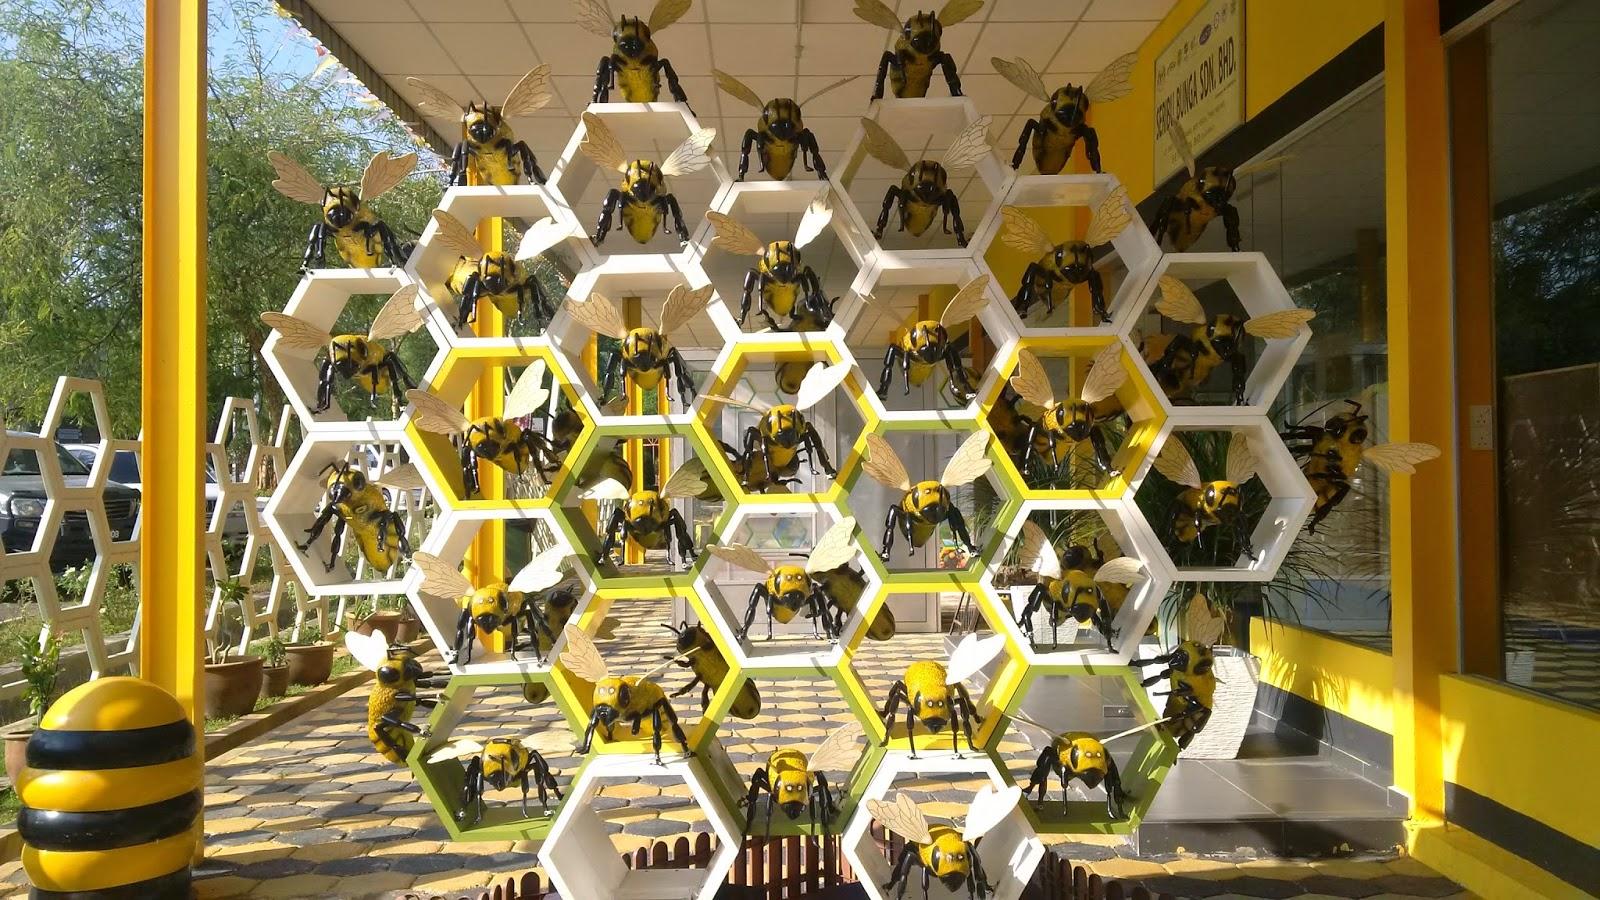 "bee gallery melaka, galeri labah melaka, how the honey is made, homemade honey, ""malaysia travel influencer,  malaysia influencer,  blog with cris,  malaysia blogger,  malaysia freelance model,  bee farm melaka malaysia,  giant b propolis,  giant b honey benefits,  taman lebah melaka harga,  giant b royal jelly,  zoo melaka,  taman burung melaka,  buy honey online malaysia,  propolis malaysia supplier,  malaysia best honey,  melaka bird park ticket price 2019,  where to buy honeycomb in kl,  butterfly farm melaka,  bees museum,  ong super trading sdn bhd,  bee farm penang,  urban beekeeping malaysia,  bee farm selangor,  muzium lebah melaka, hive honey, honey tasting, free entry, travel, toruism"